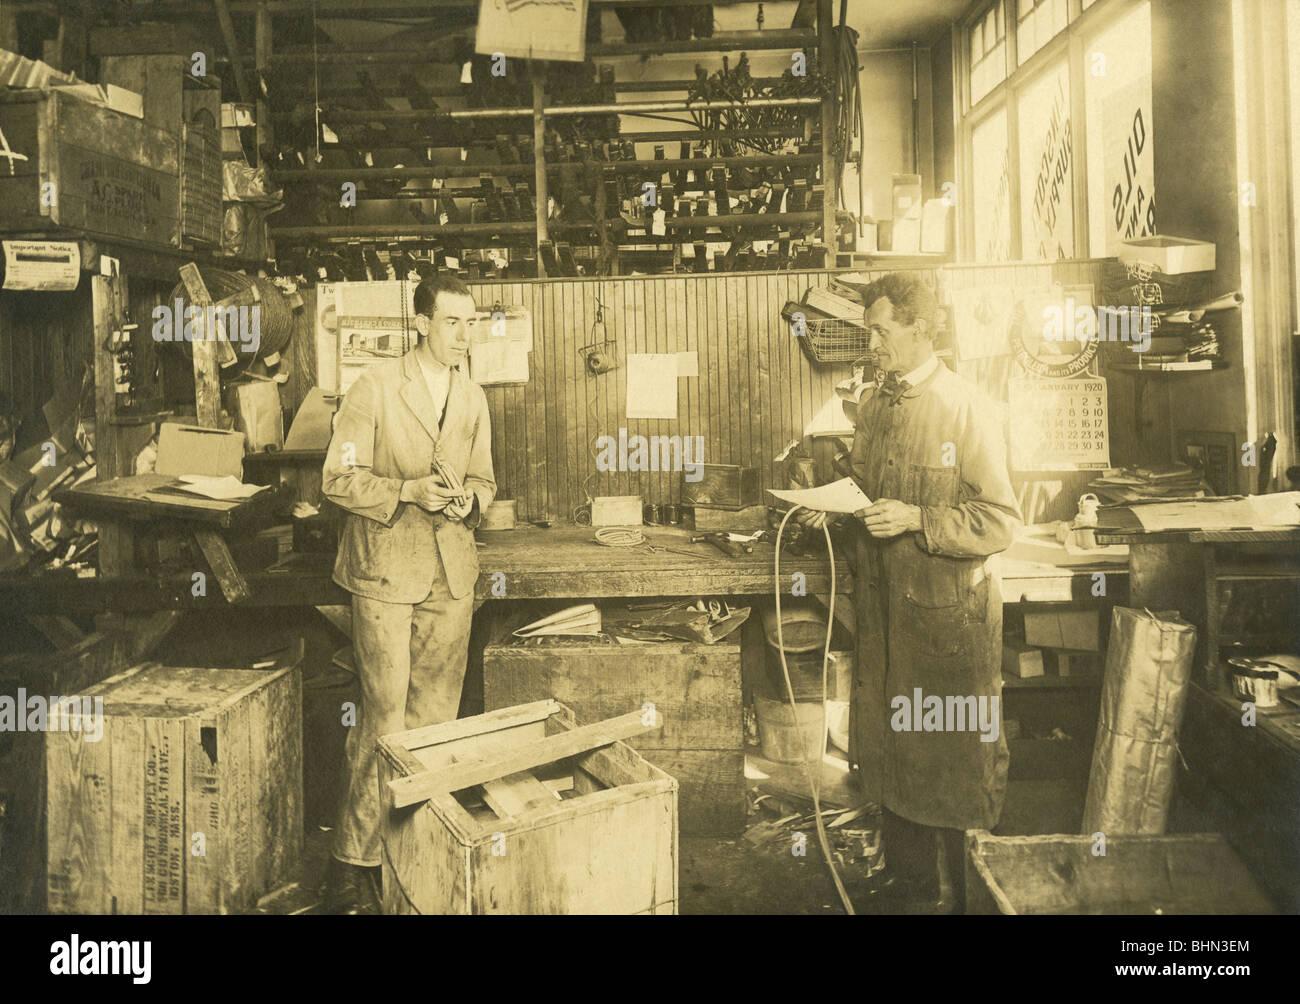 1920 Foto der Mechaniker-Garage der Linscott Motor Company, 690 Beacon Street, Boston, Massachusetts. Stockfoto